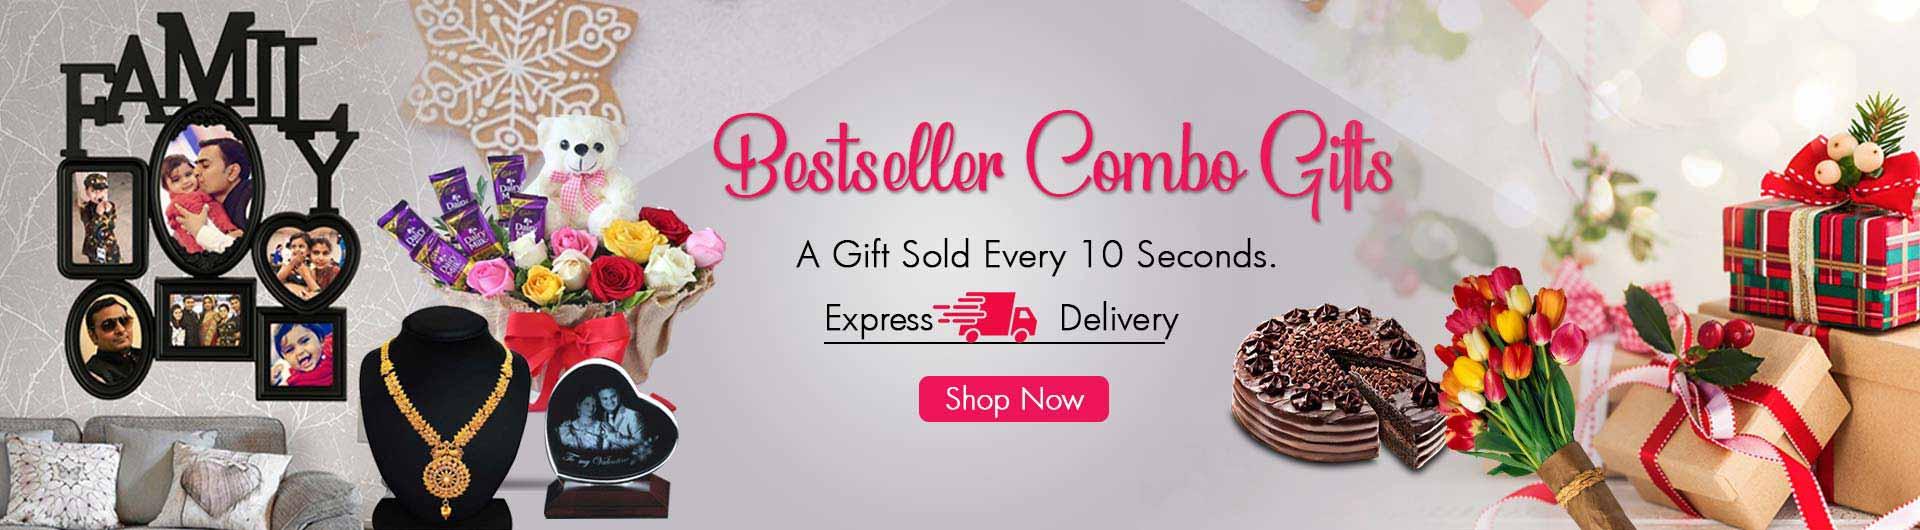 Bestseller Gifts Online